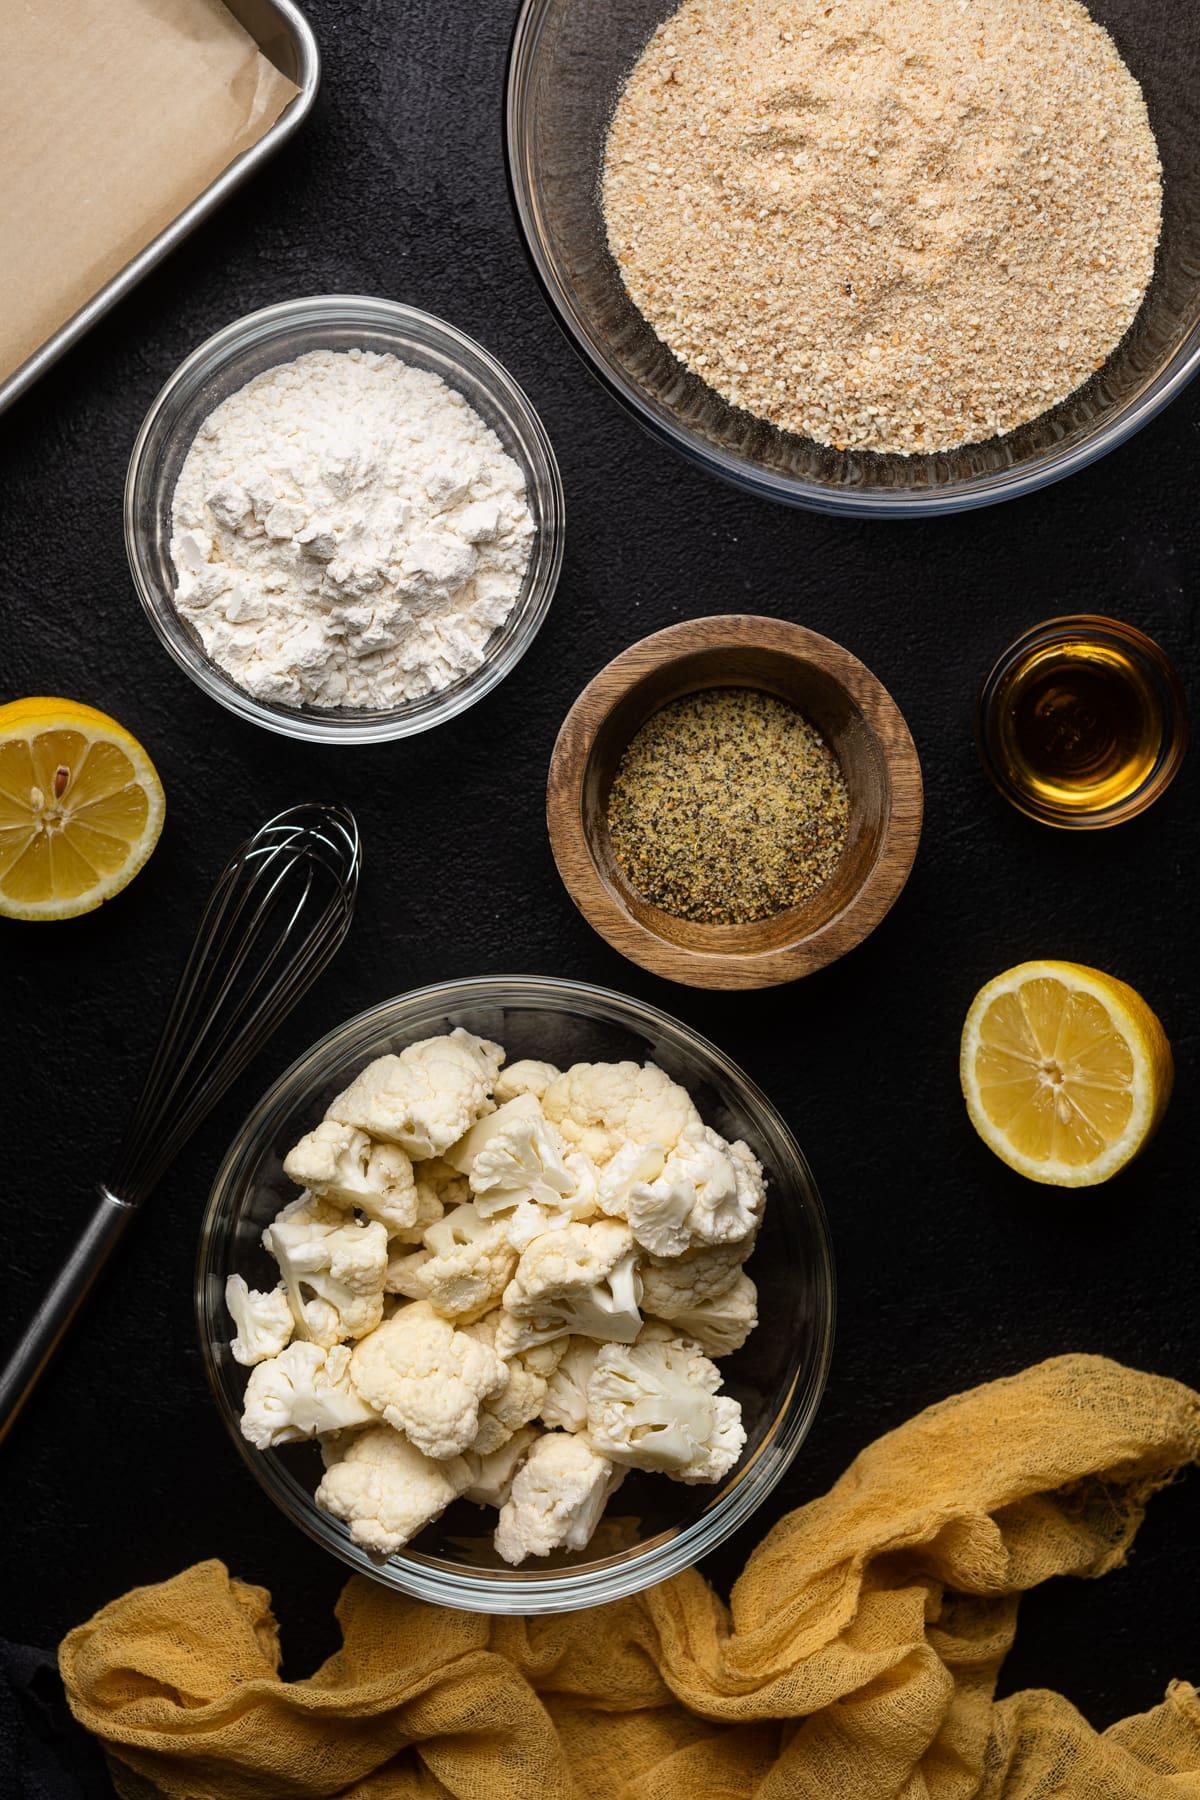 ingredients for Lemon Pepper Cauliflower Bites like cauliflower, flour, bread crumbs and lemon pepper seasoning